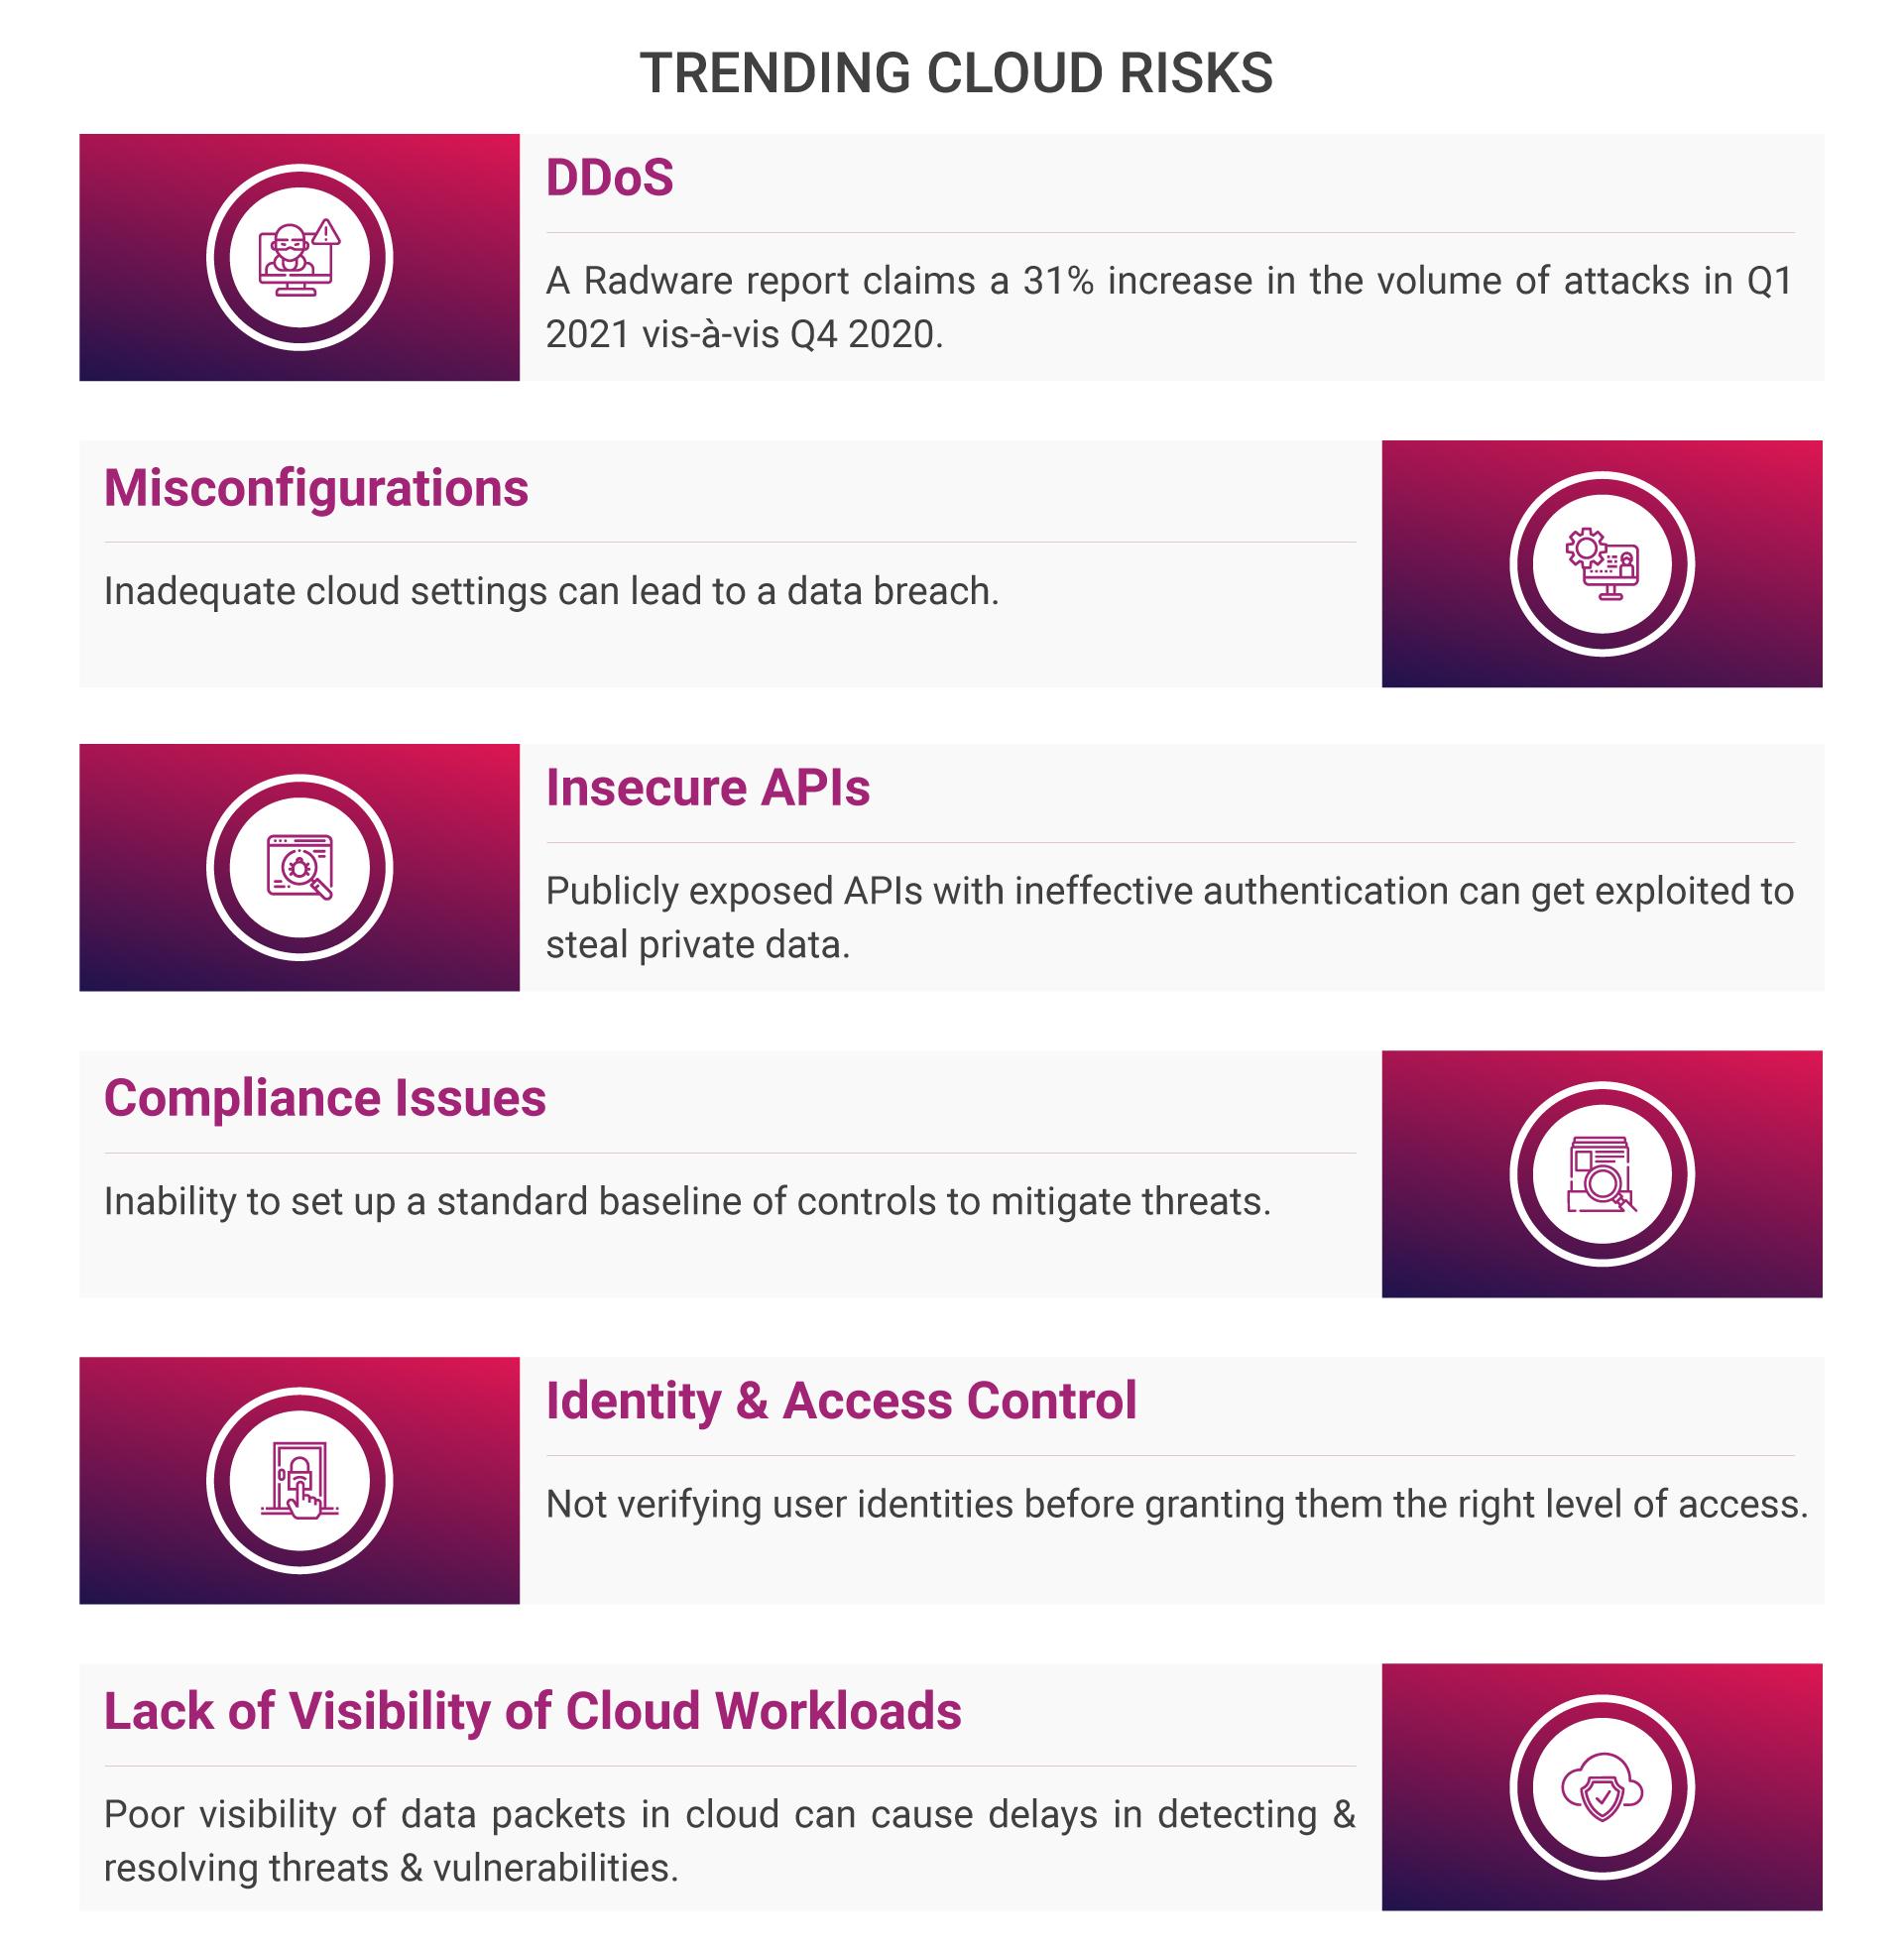 Trending Cloud Risks